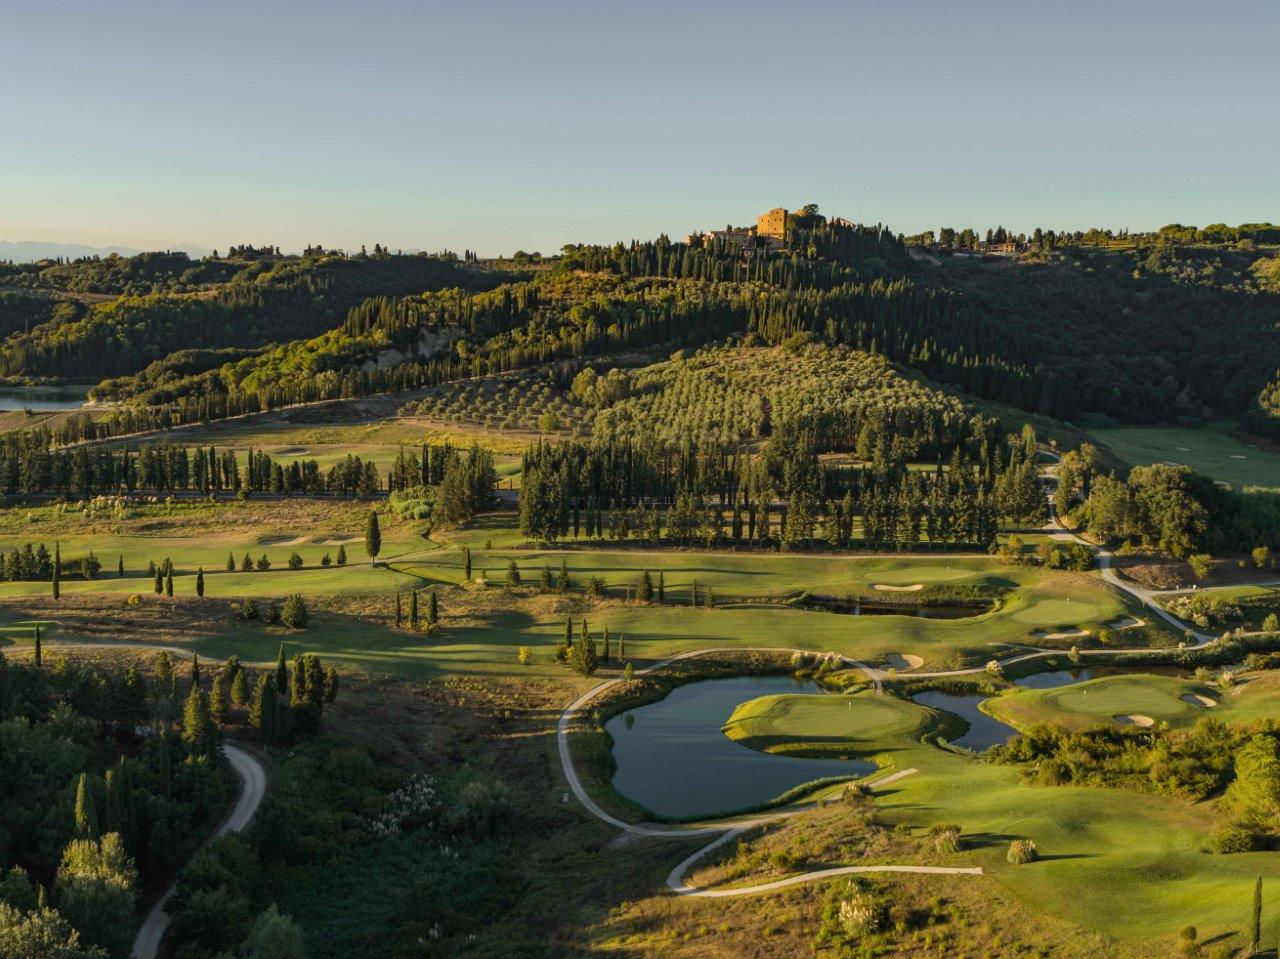 Toscana Resort Castelfalfi, il campo da golf